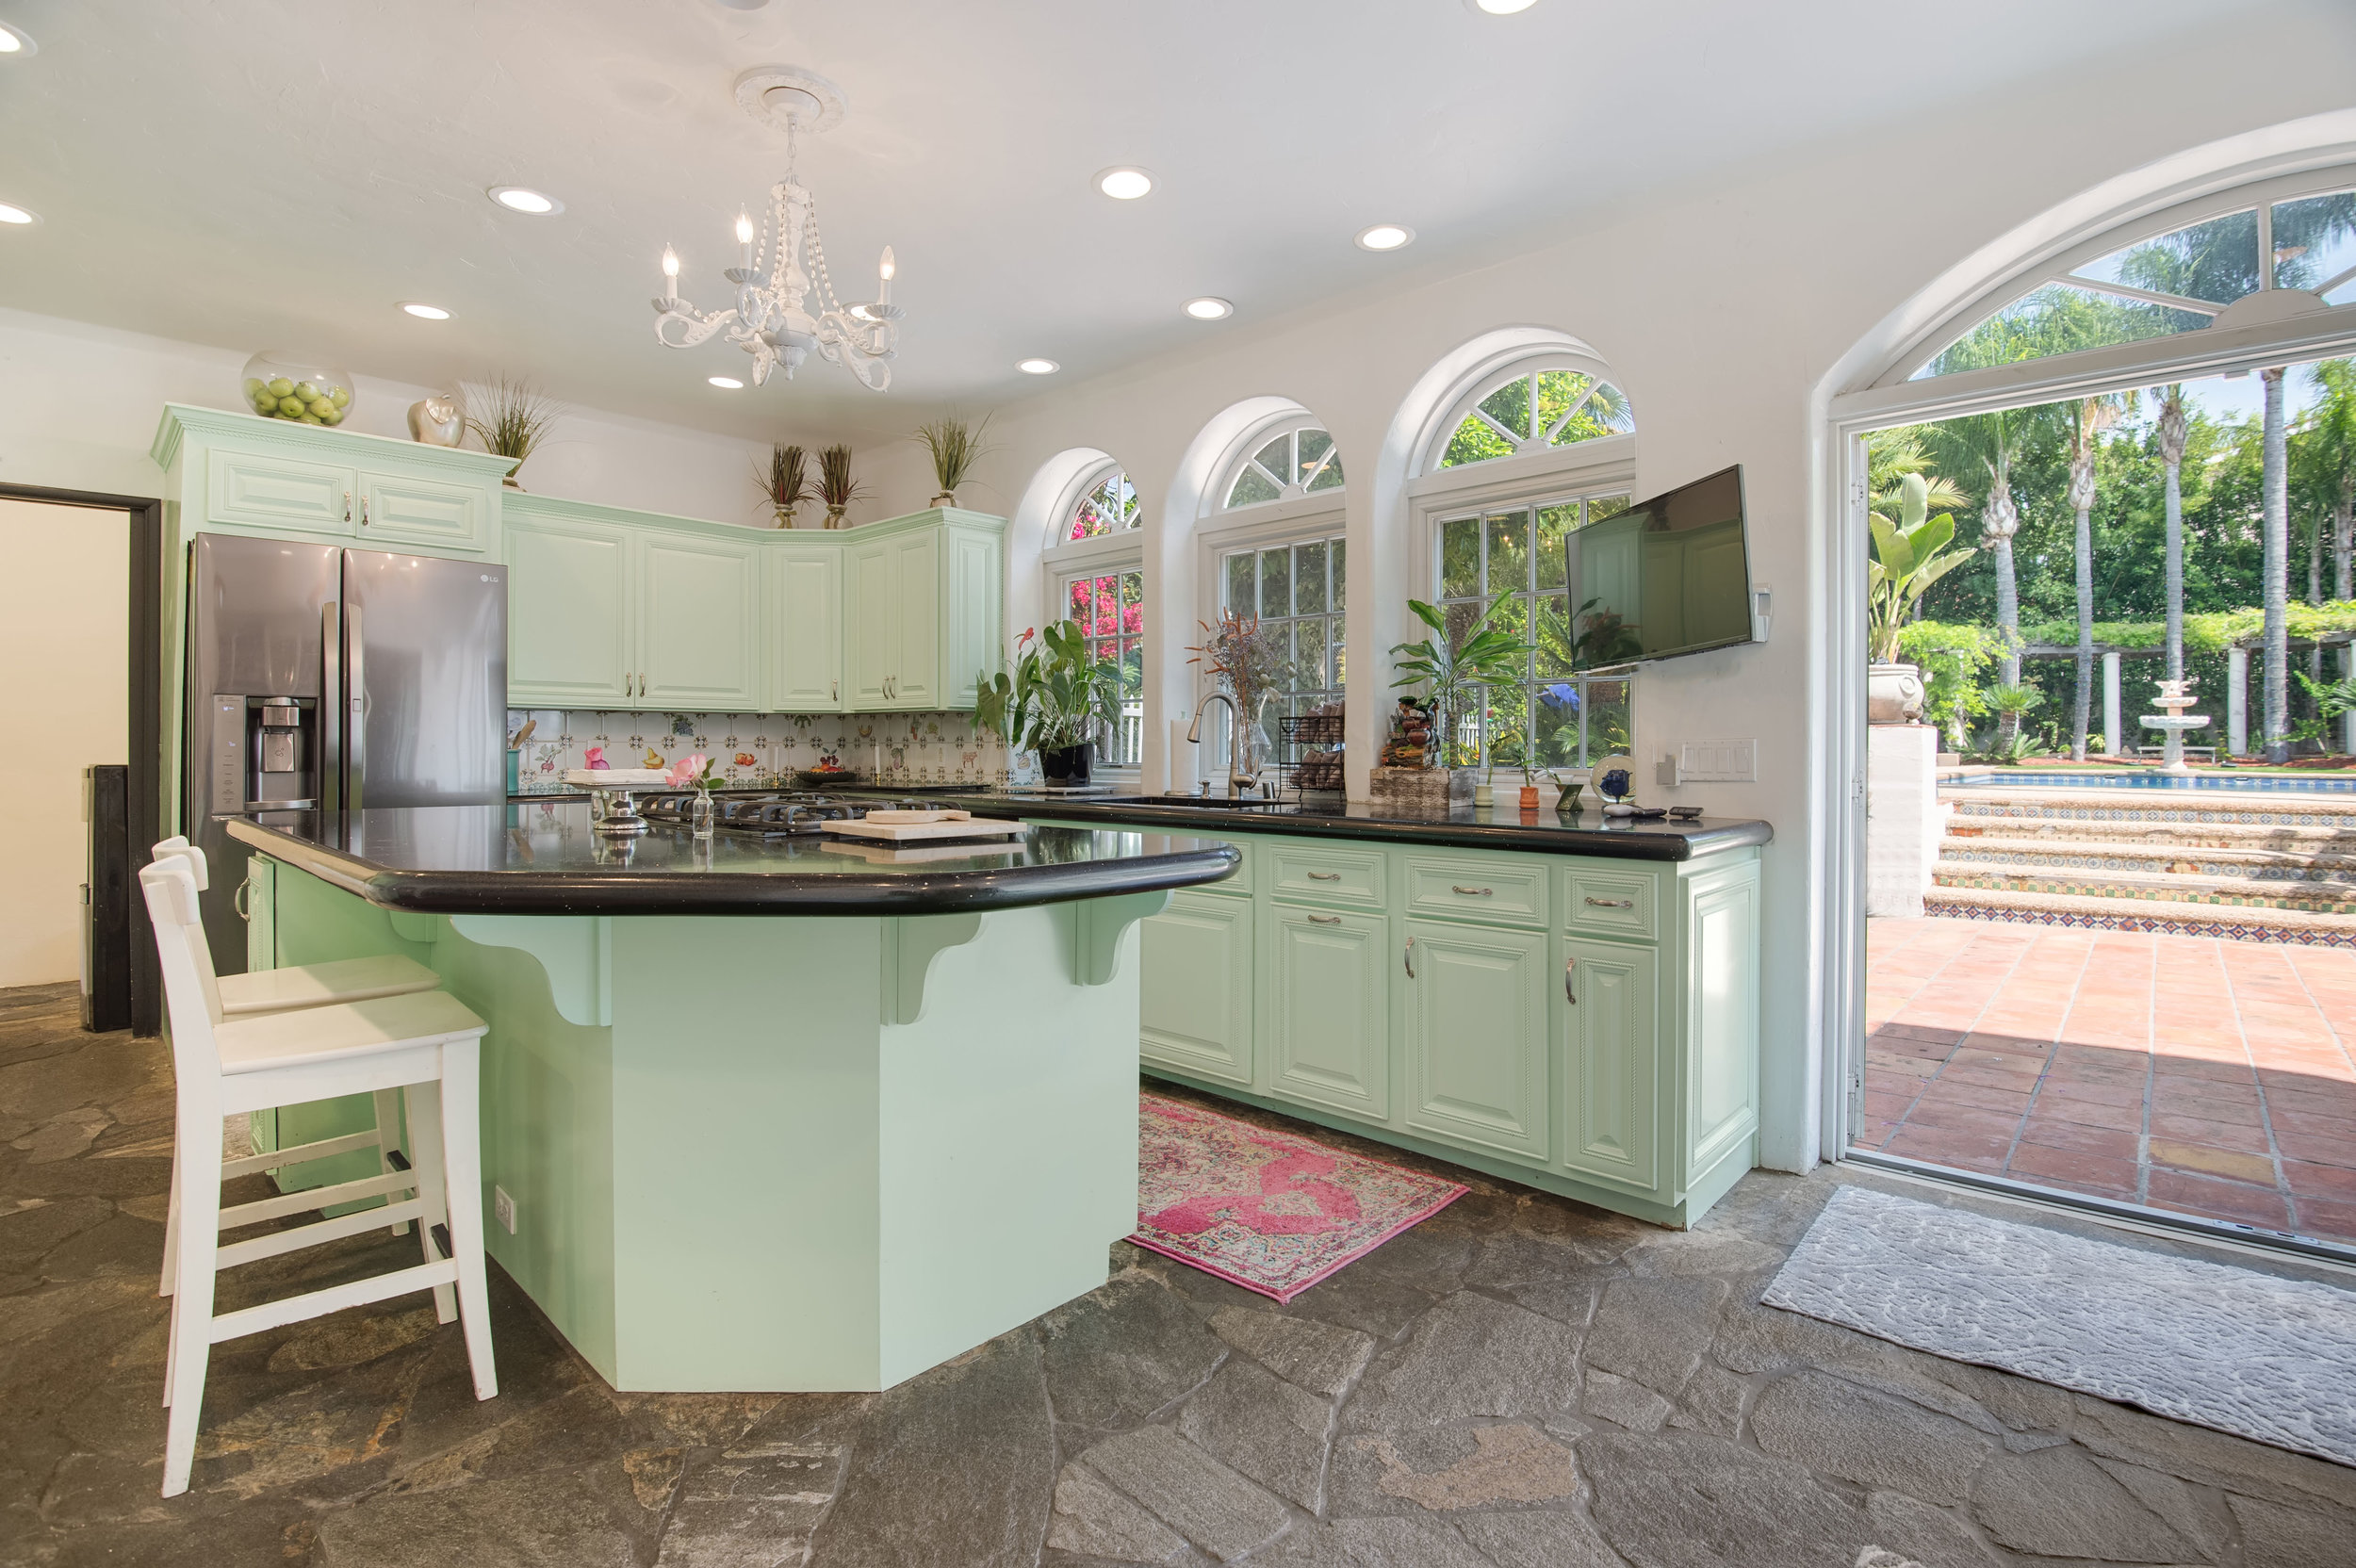 024 Kitchen 006 Pool 4915 Los Feliz For Sale Los Angeles Lease The Malibu Life Team Luxury Real Estate.jpg